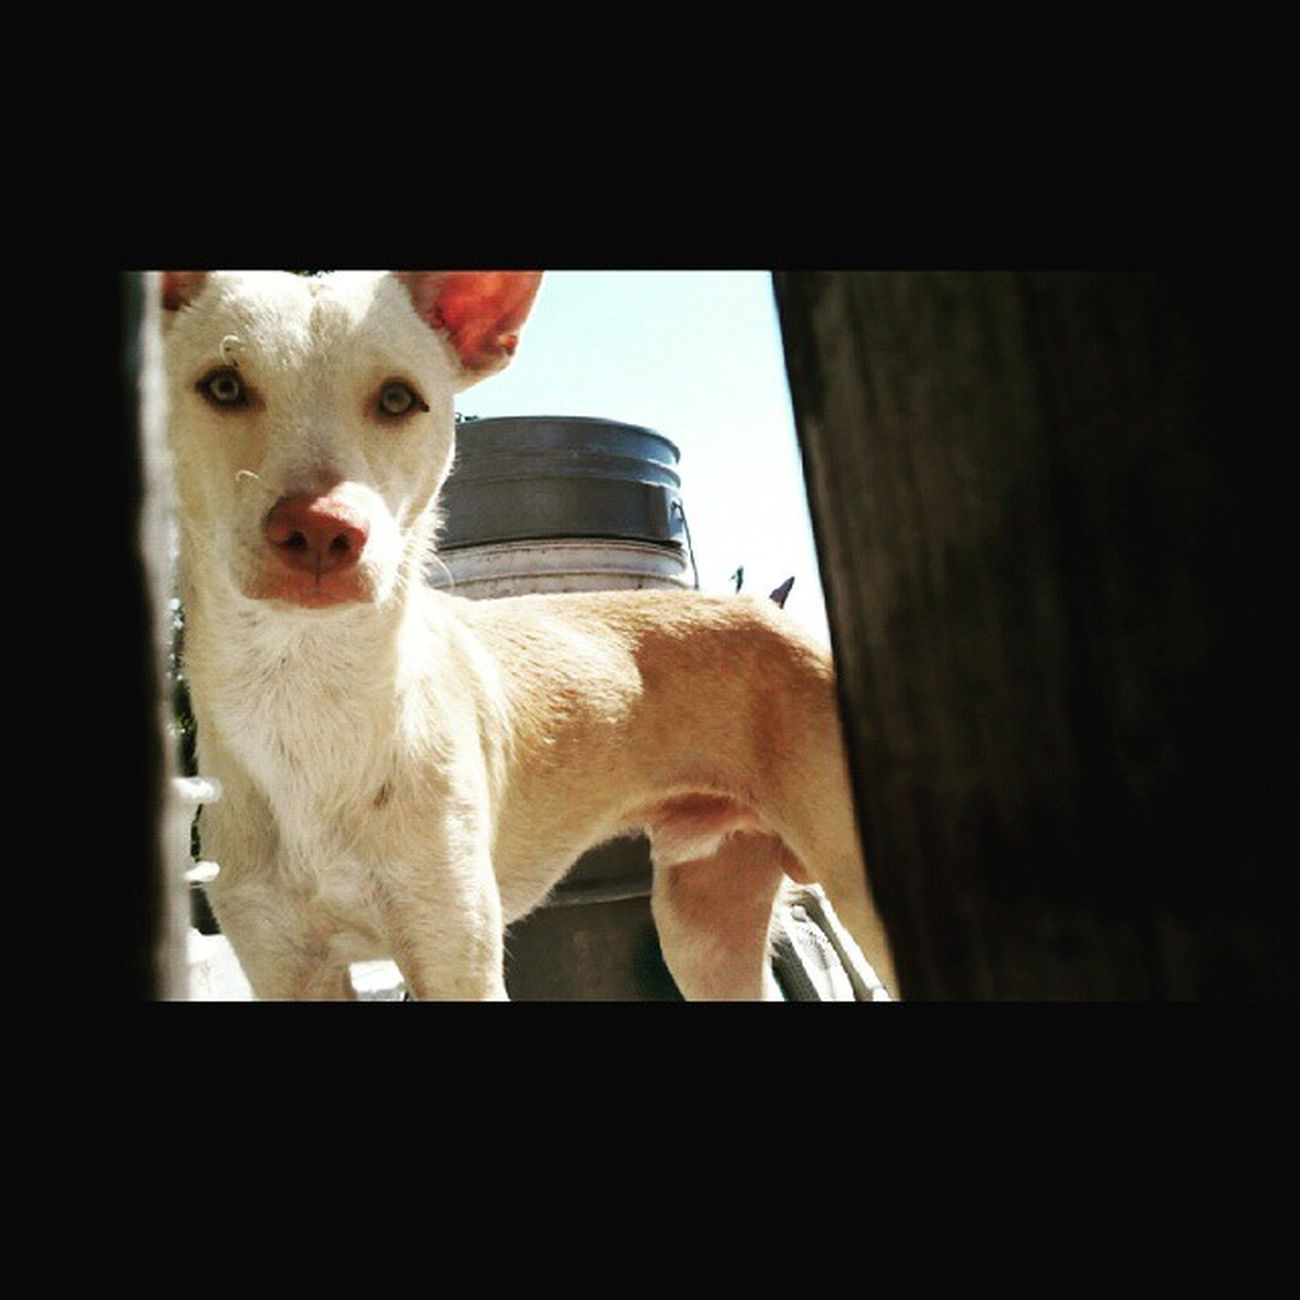 Pipo Picture Gallery Dog FotoDelDia Siguemeytesigo Instalike Instamoment